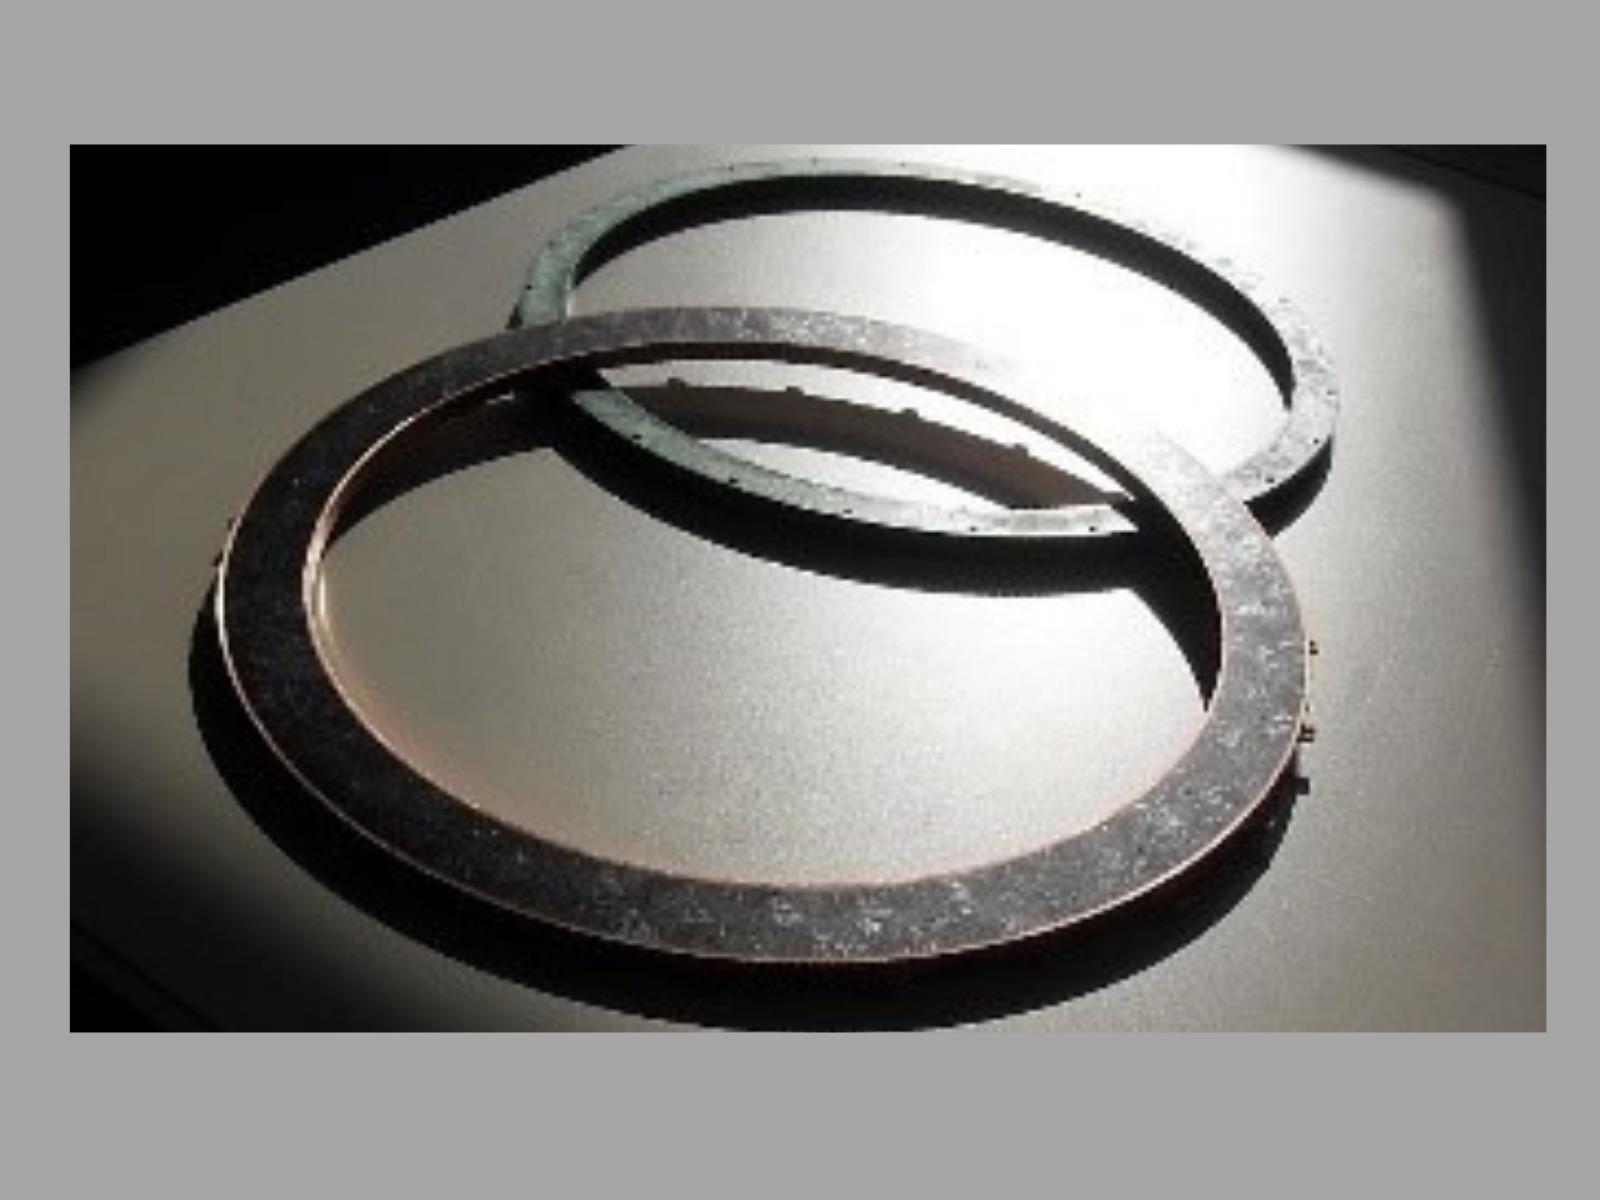 453 mm HTS assembled ring